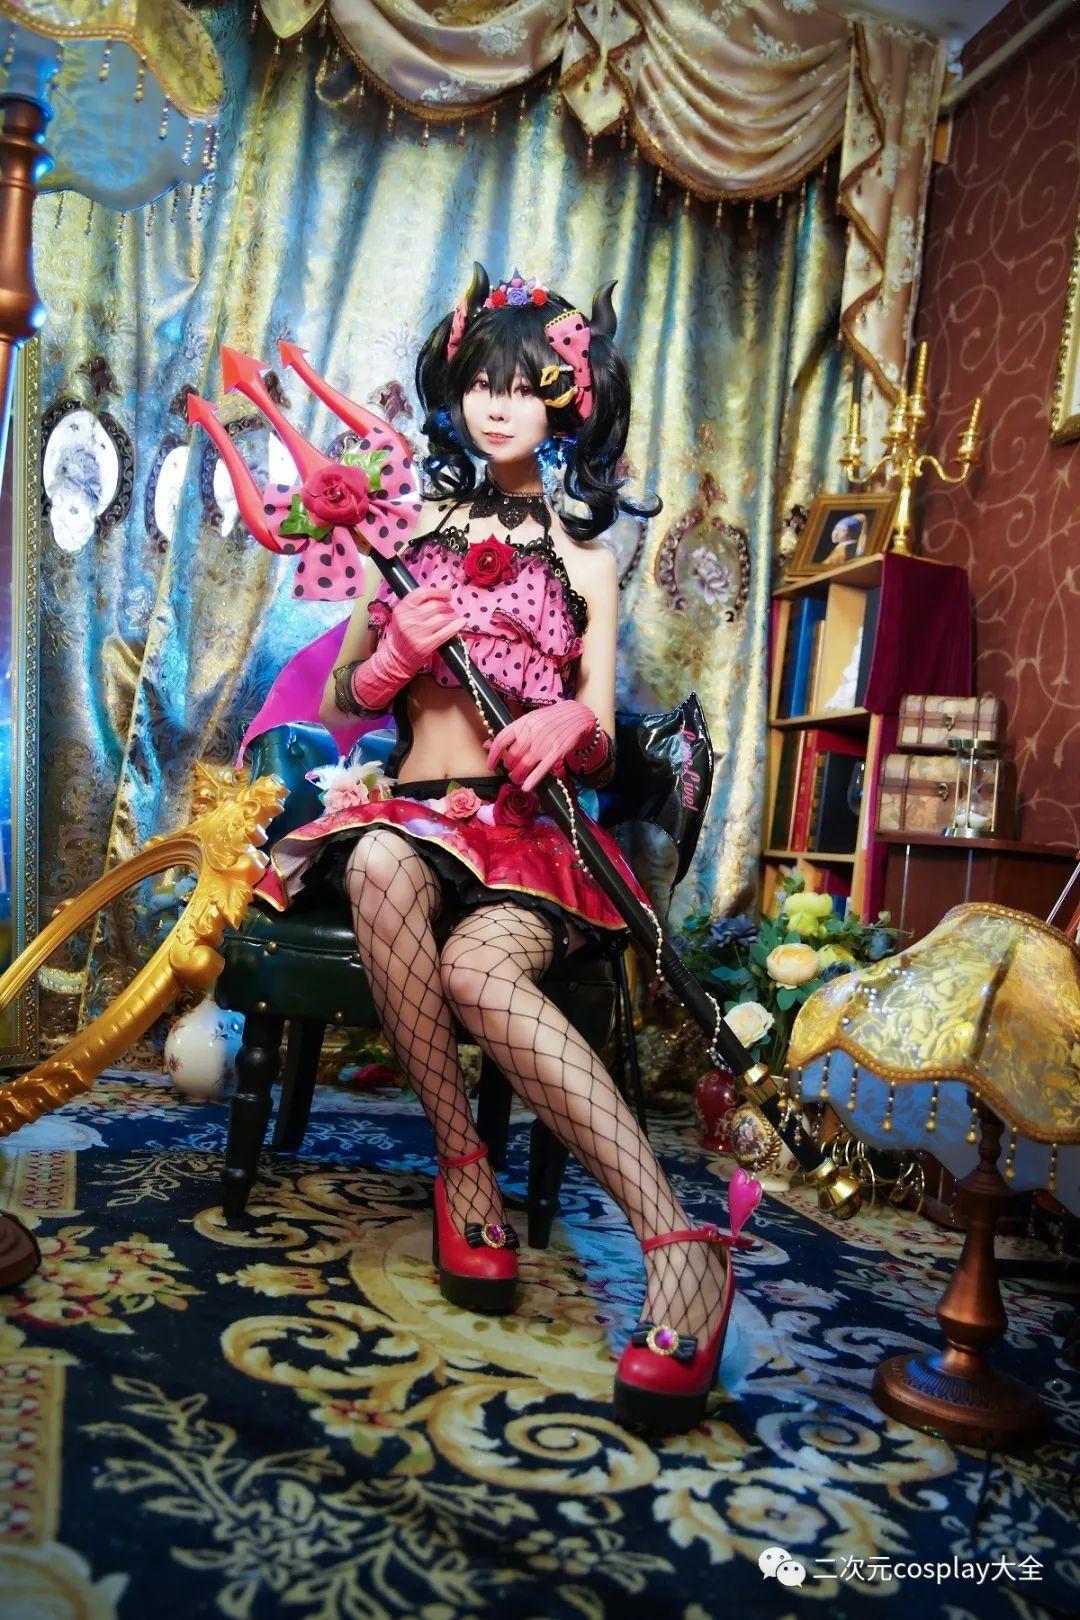 cosplay – 《lovelive!》小恶魔觉醒矢泽妮可,第一秒以为是可爱,然而被网格黑丝所吸引 - [leimu486.com] No.7